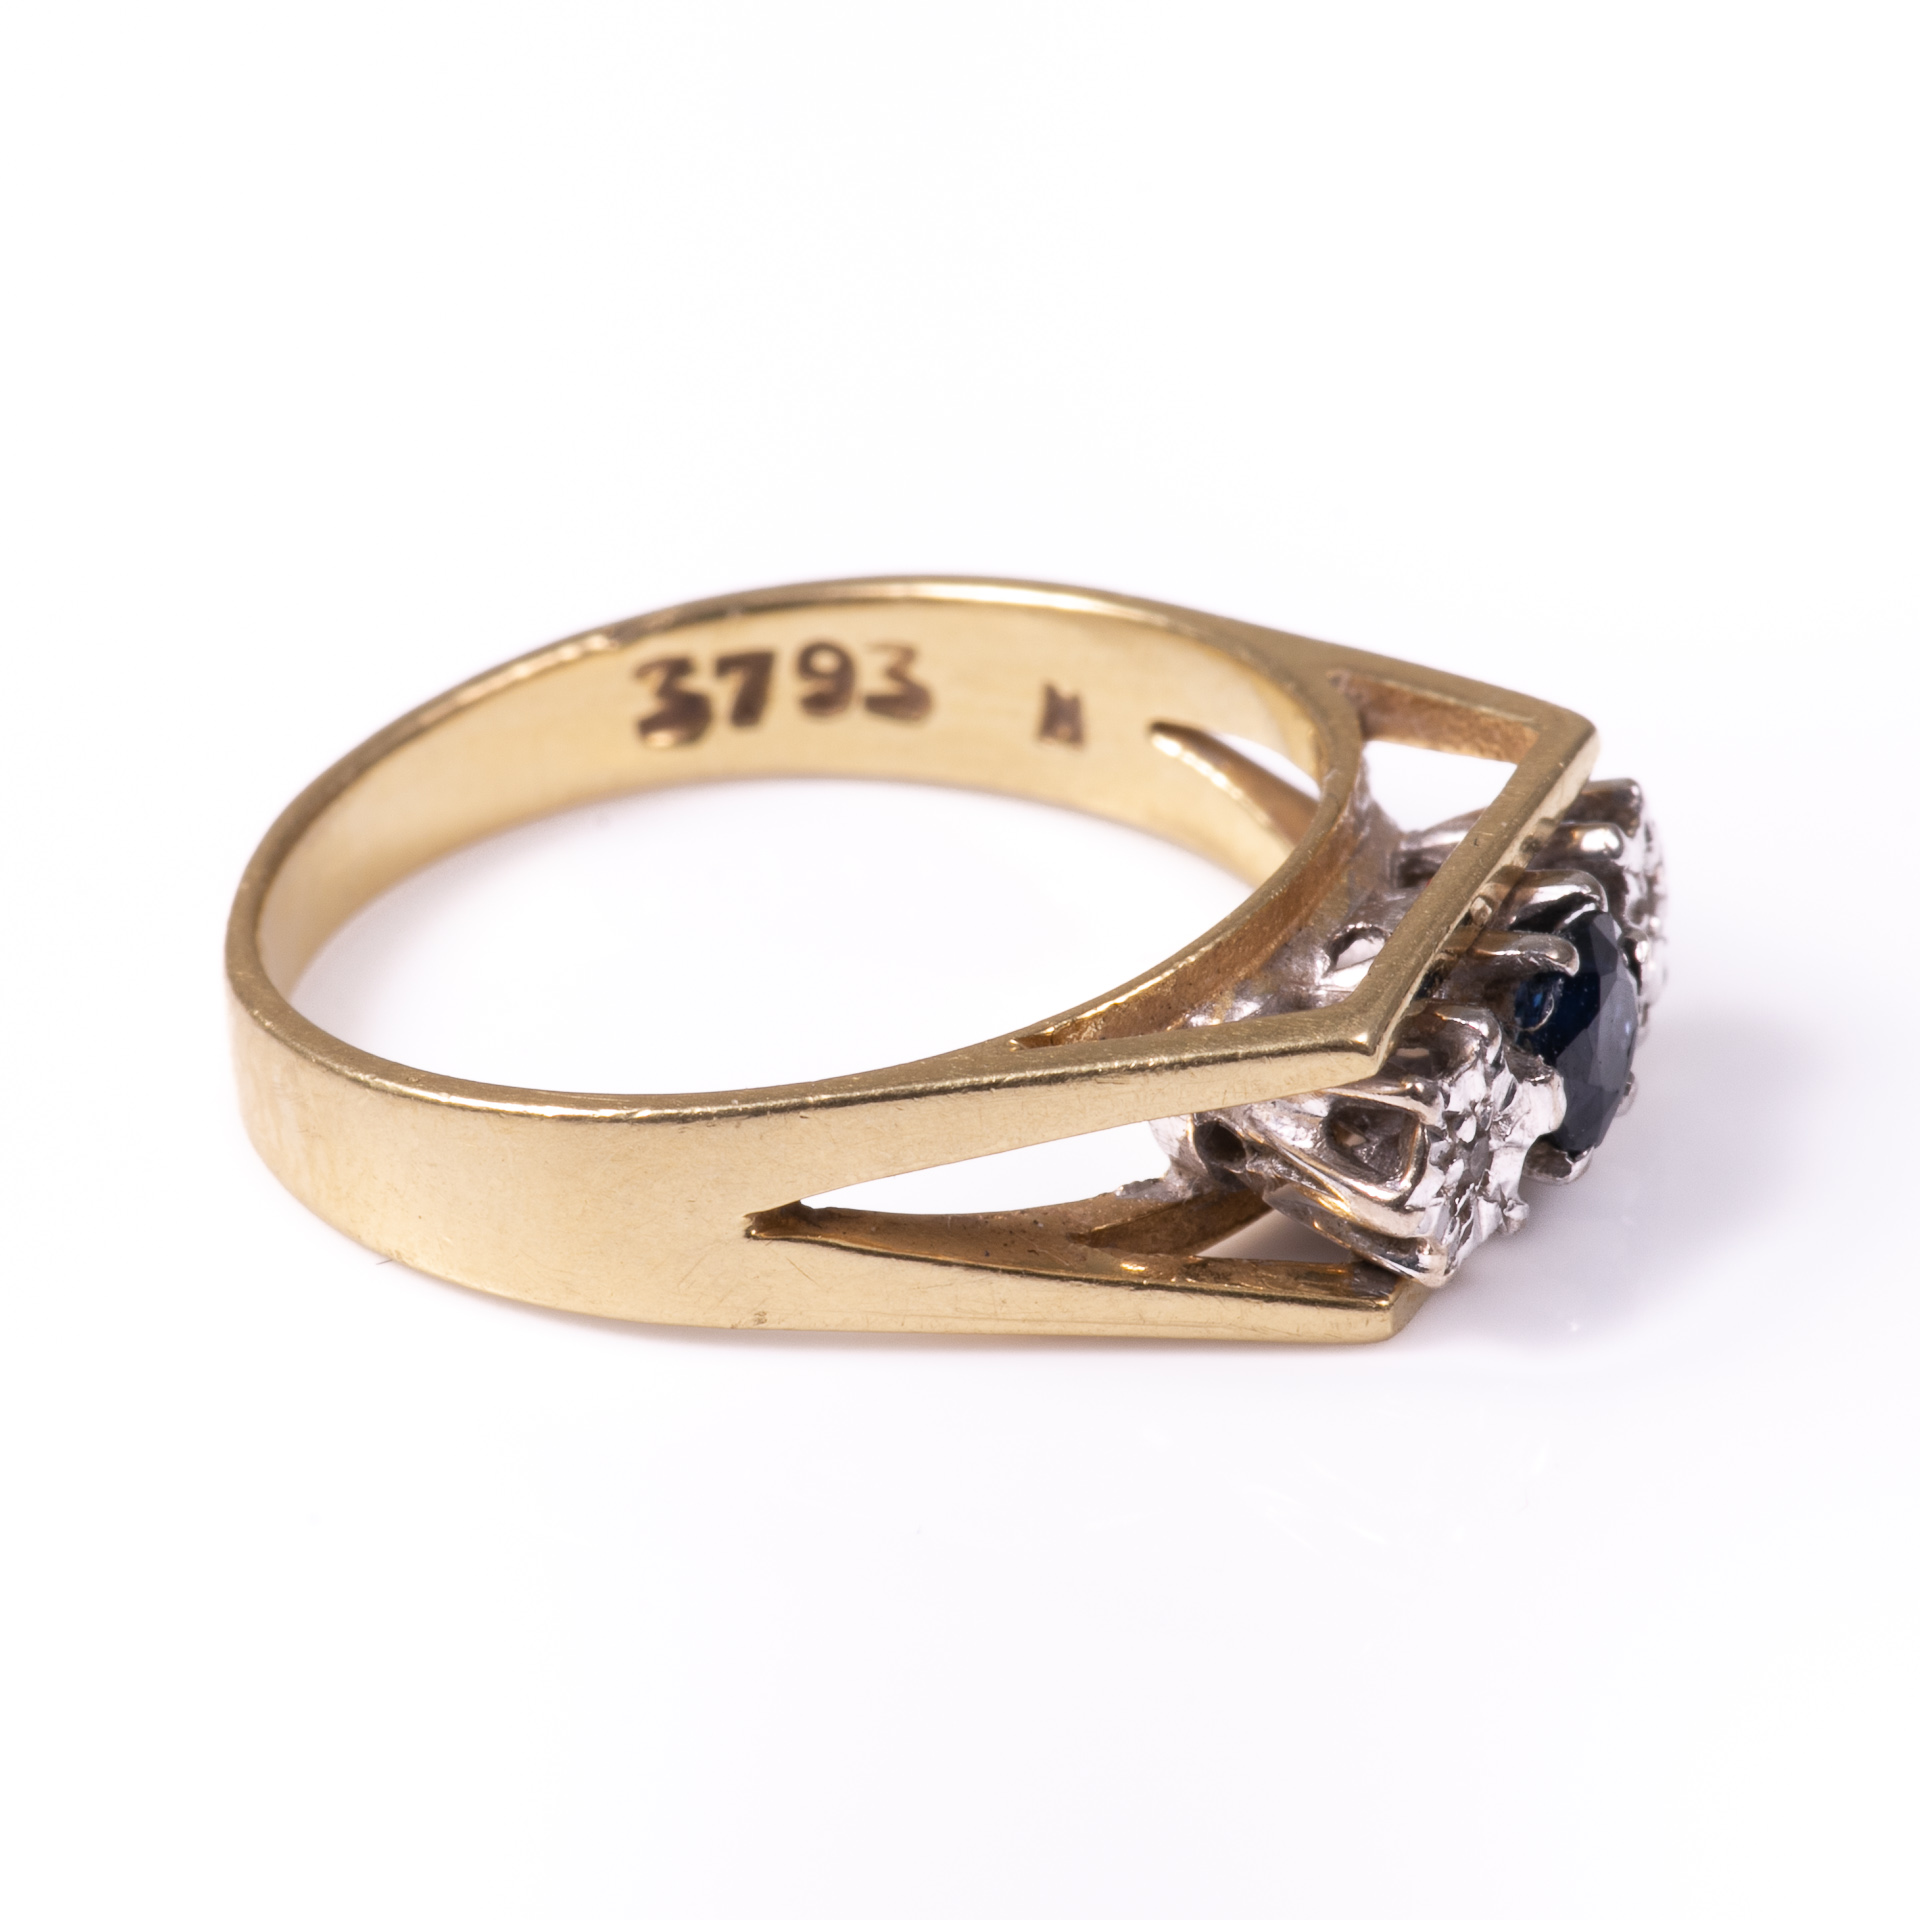 18ct Gold Sapphire & Diamond Ring - Image 6 of 6